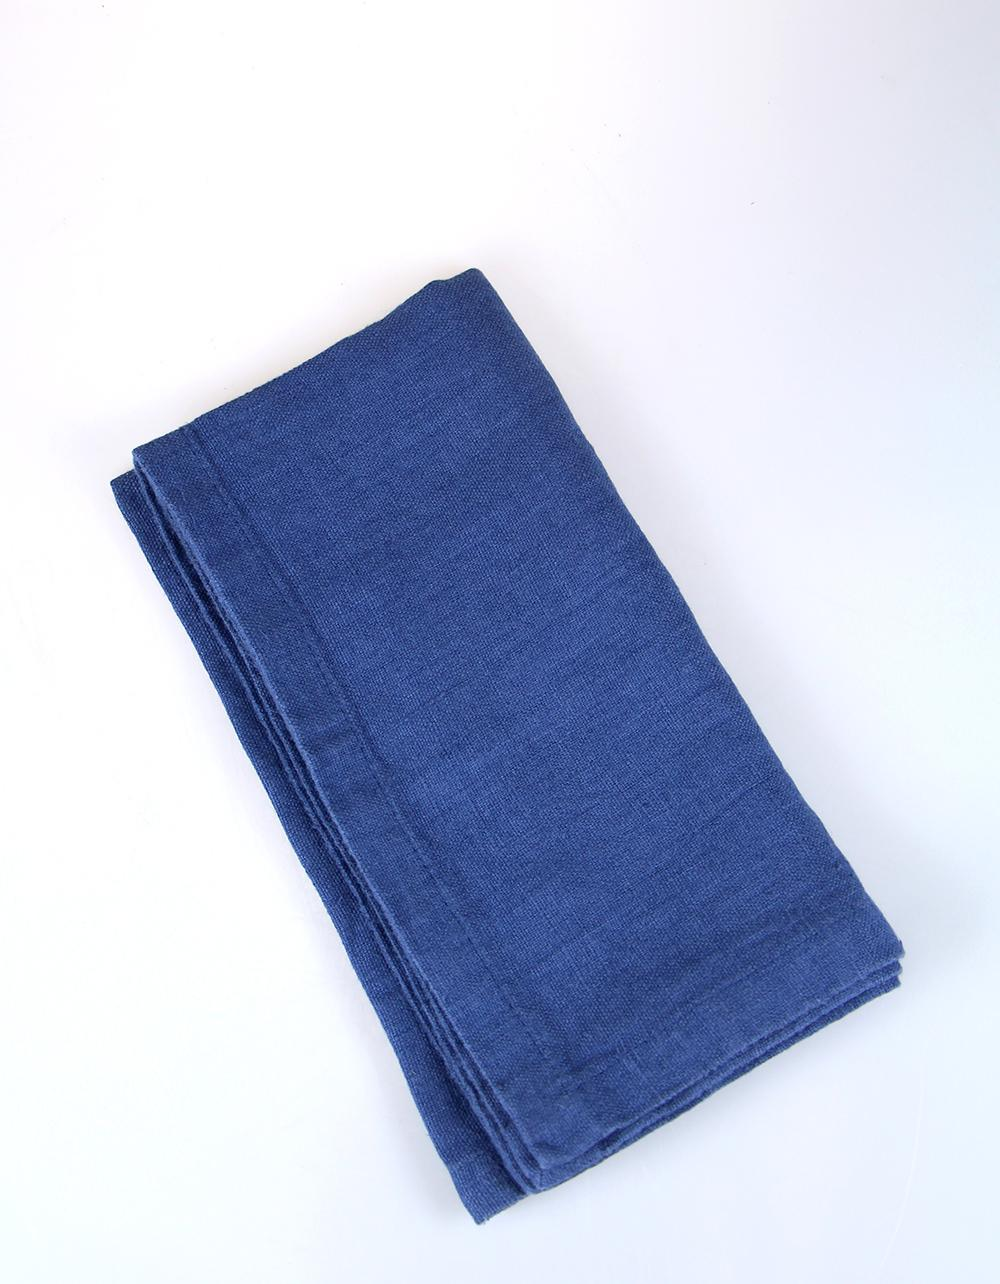 The Essential Ingredient Pure Linen Napkin - Blue 45cm x 45cm